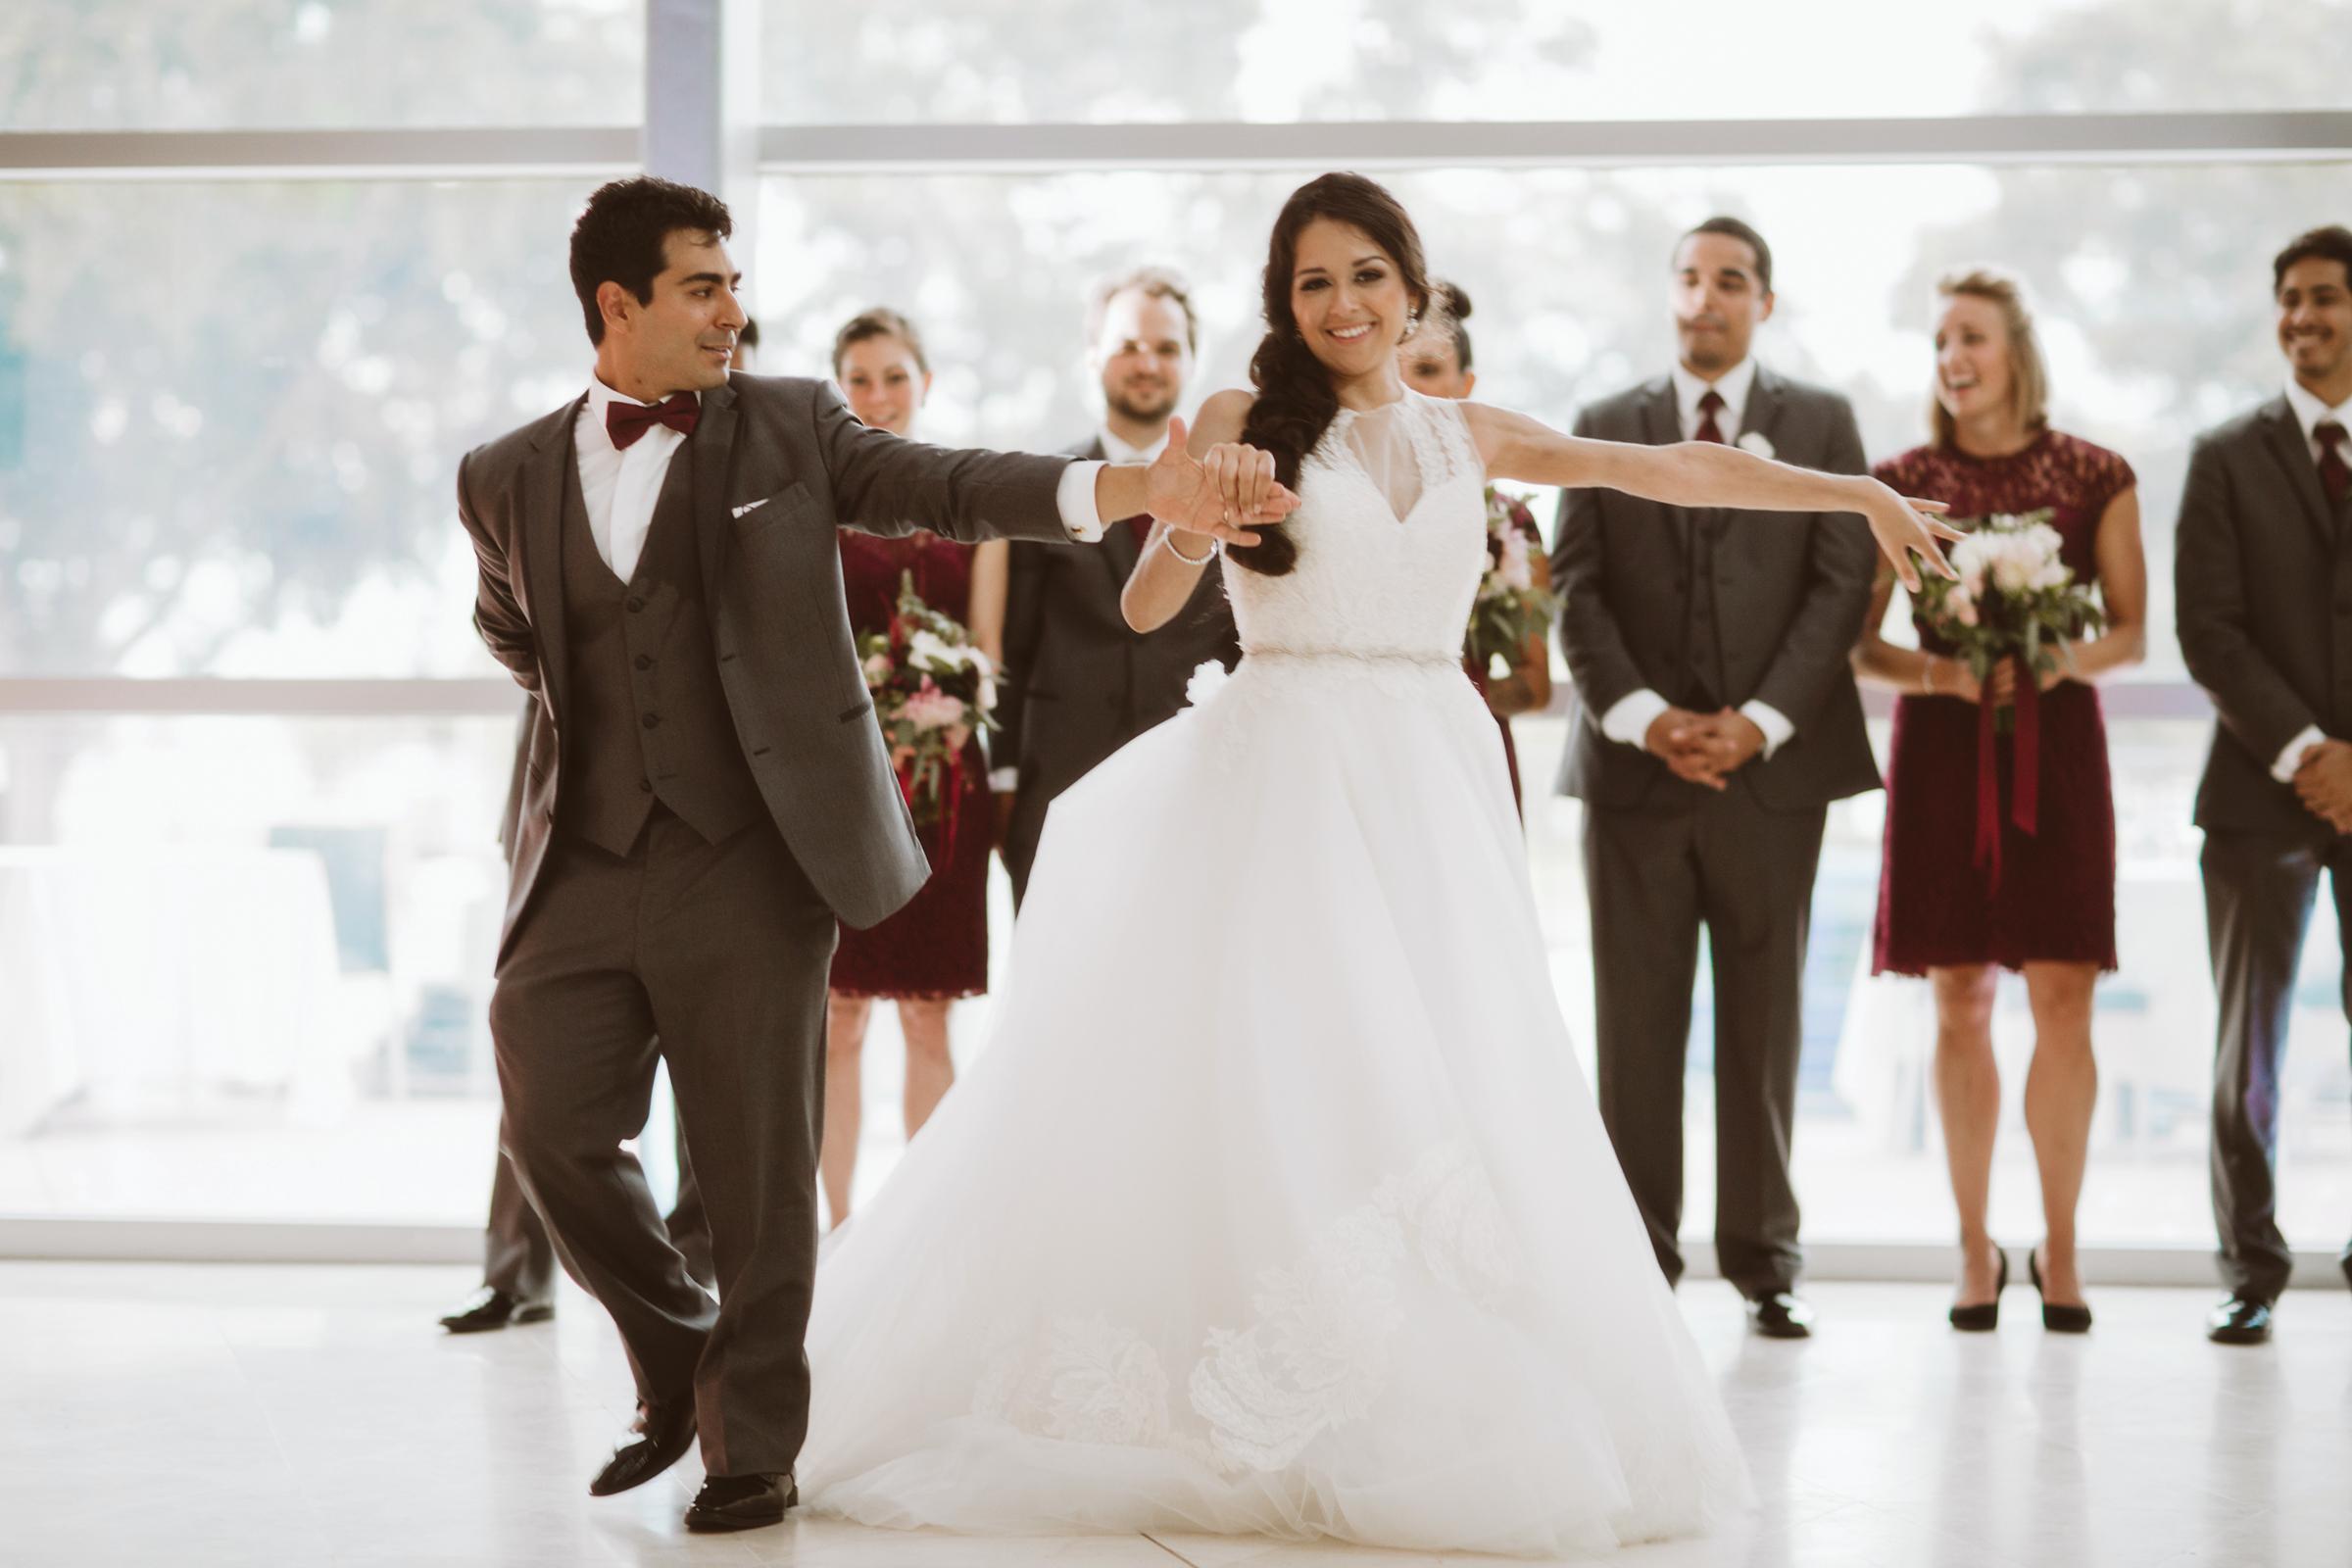 wedding day | MFA St Pete | Vanessa Boy Photography | vanessaboy.com-533.com |final.jpg